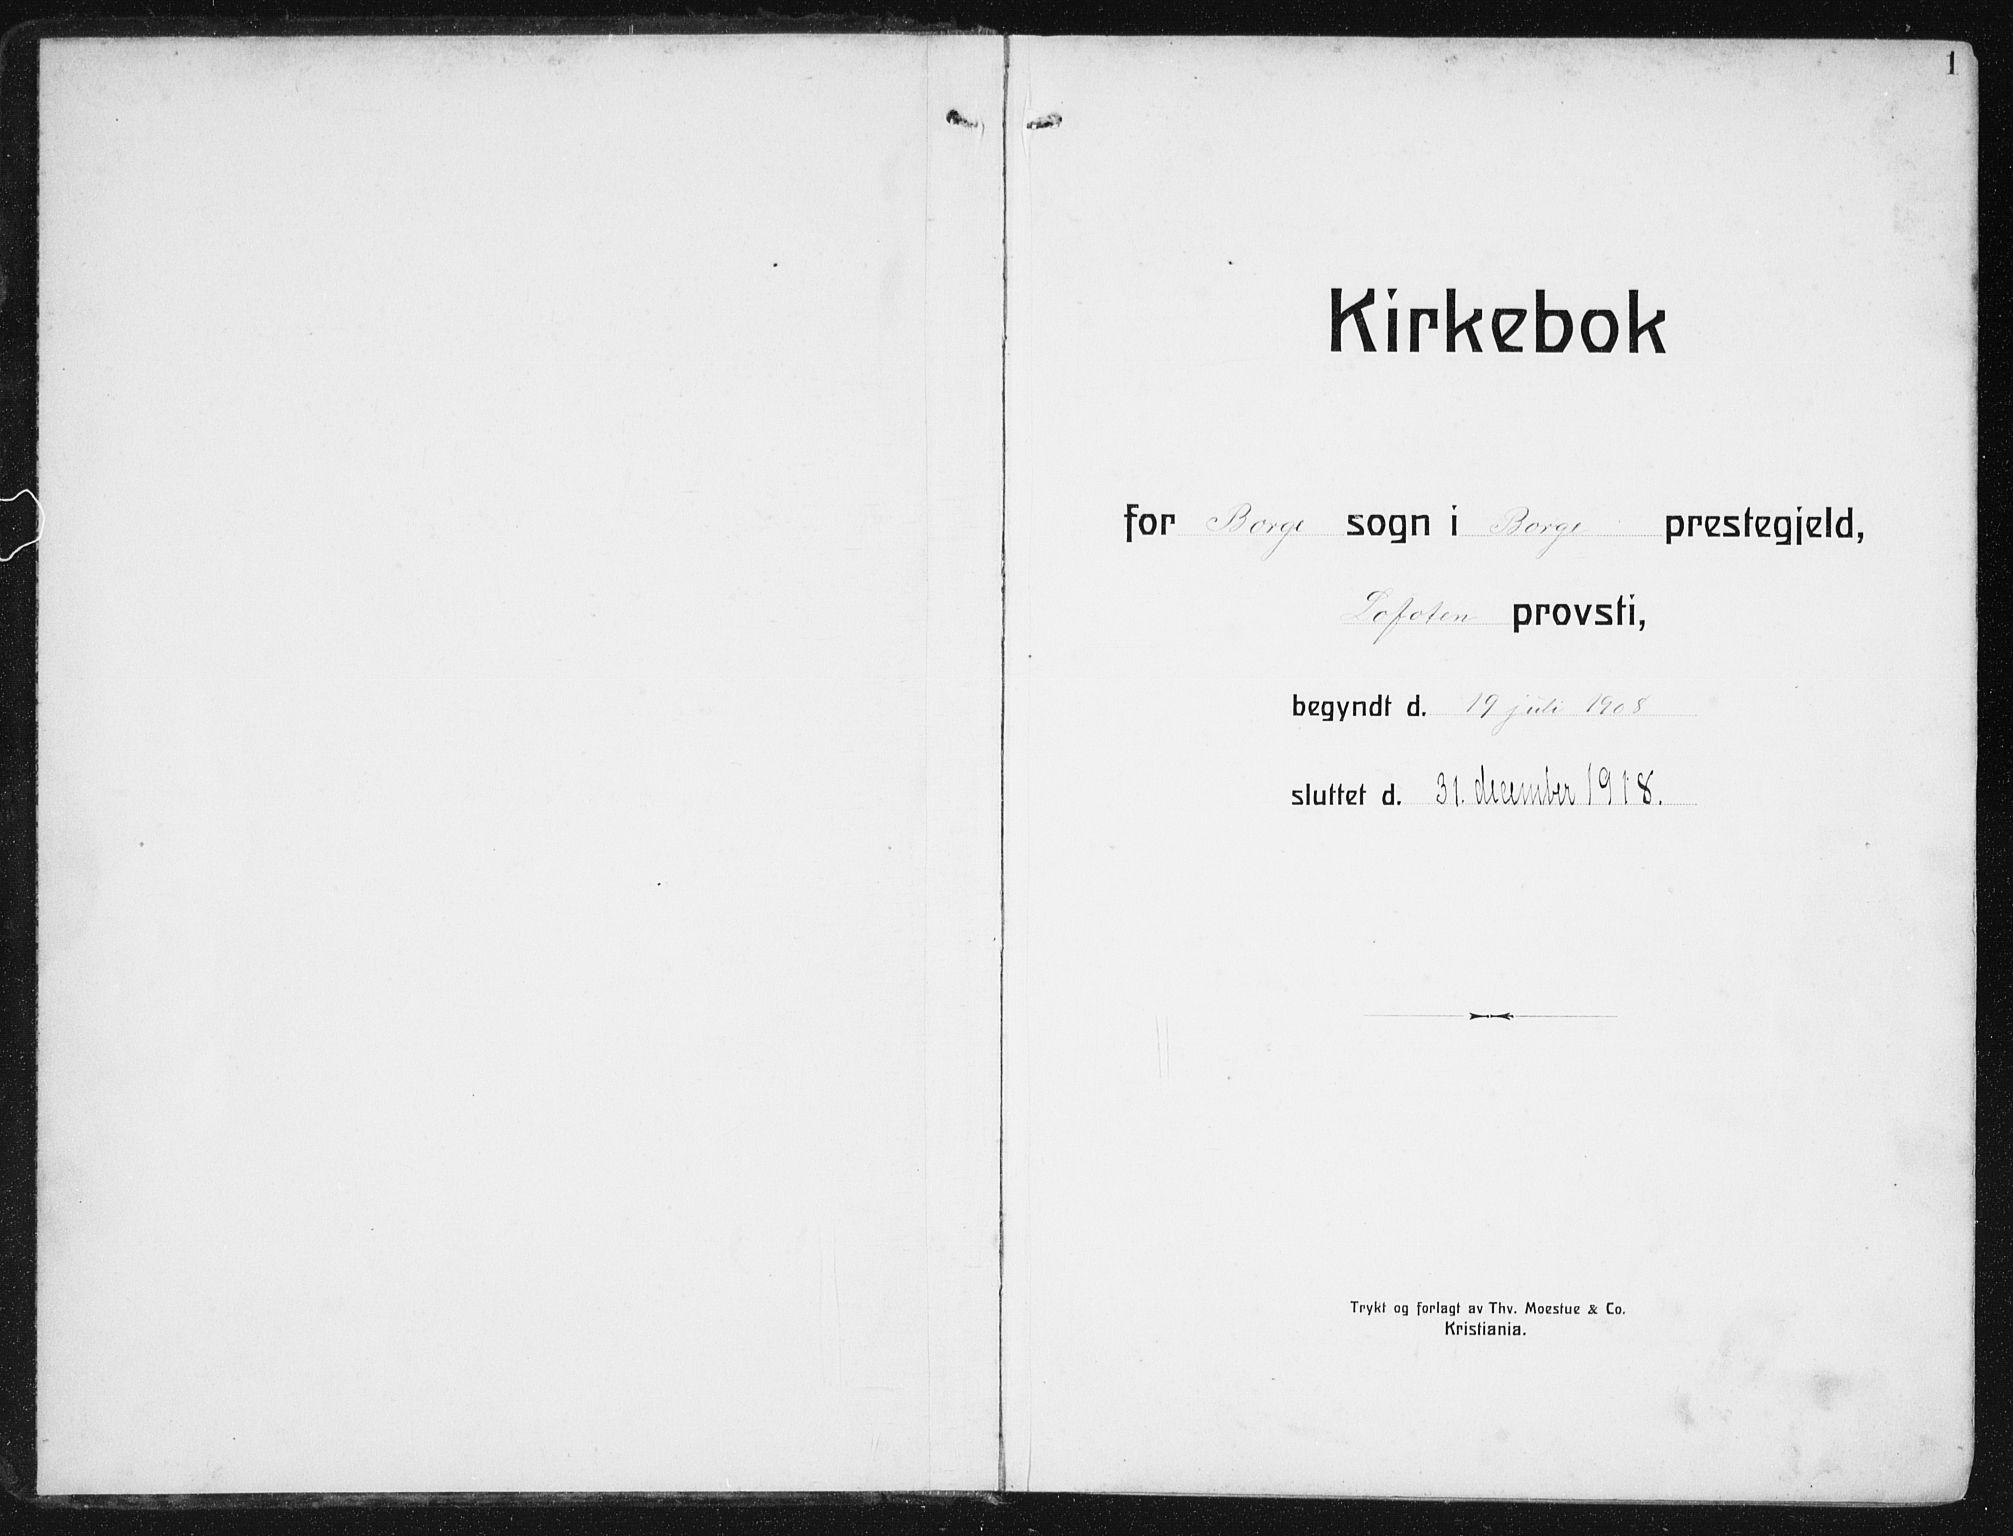 SAT, Ministerialprotokoller, klokkerbøker og fødselsregistre - Nordland, 880/L1135: Ministerialbok nr. 880A09, 1908-1919, s. 1